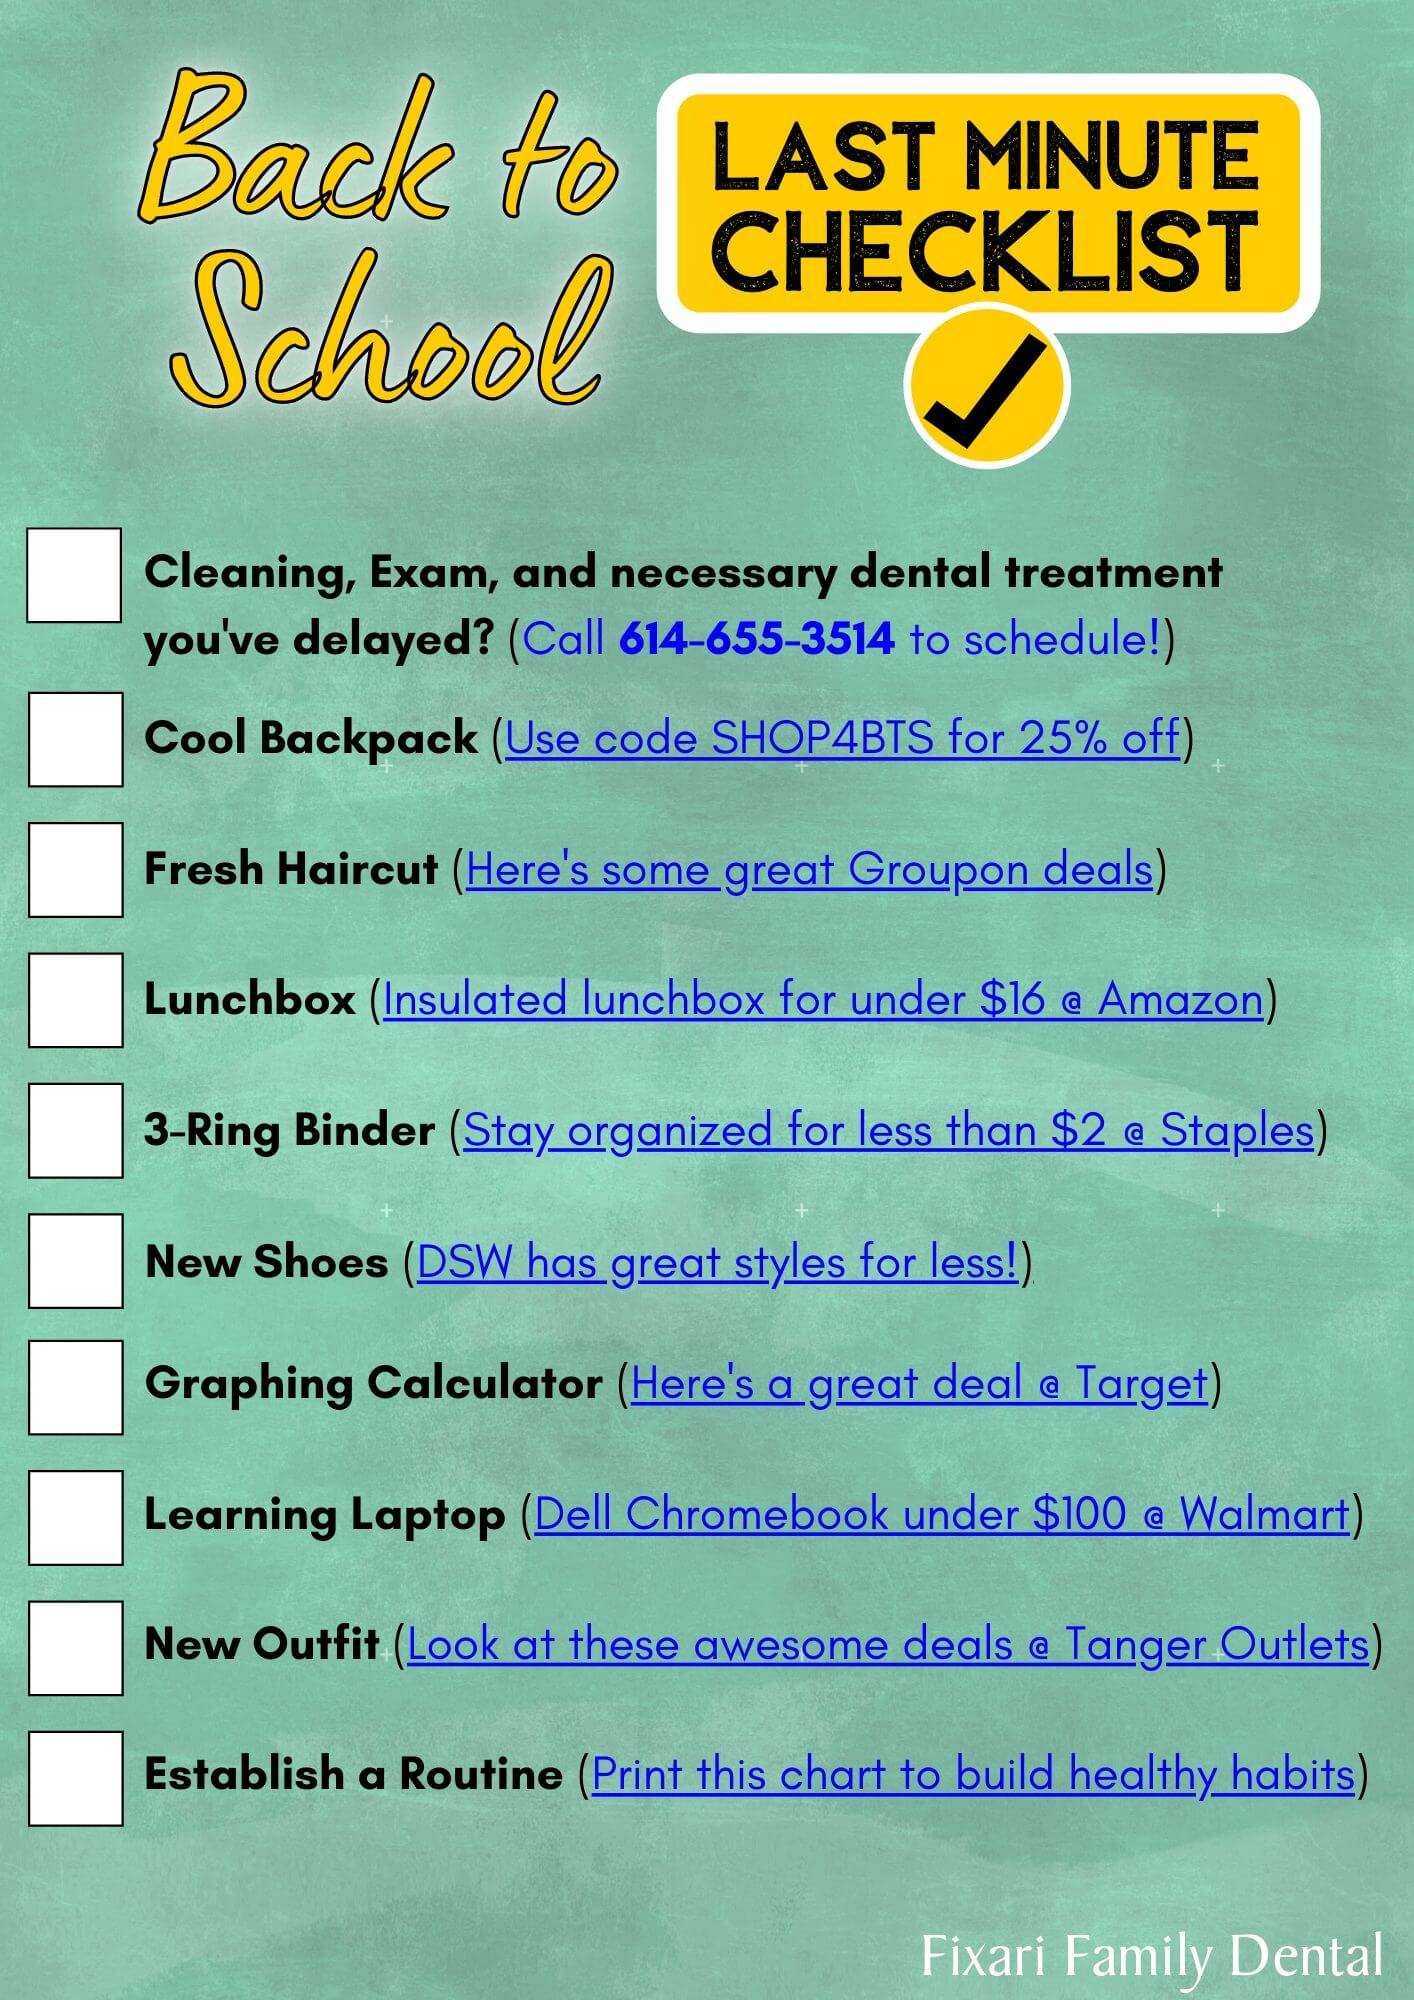 Back to School Last Minute Checklist